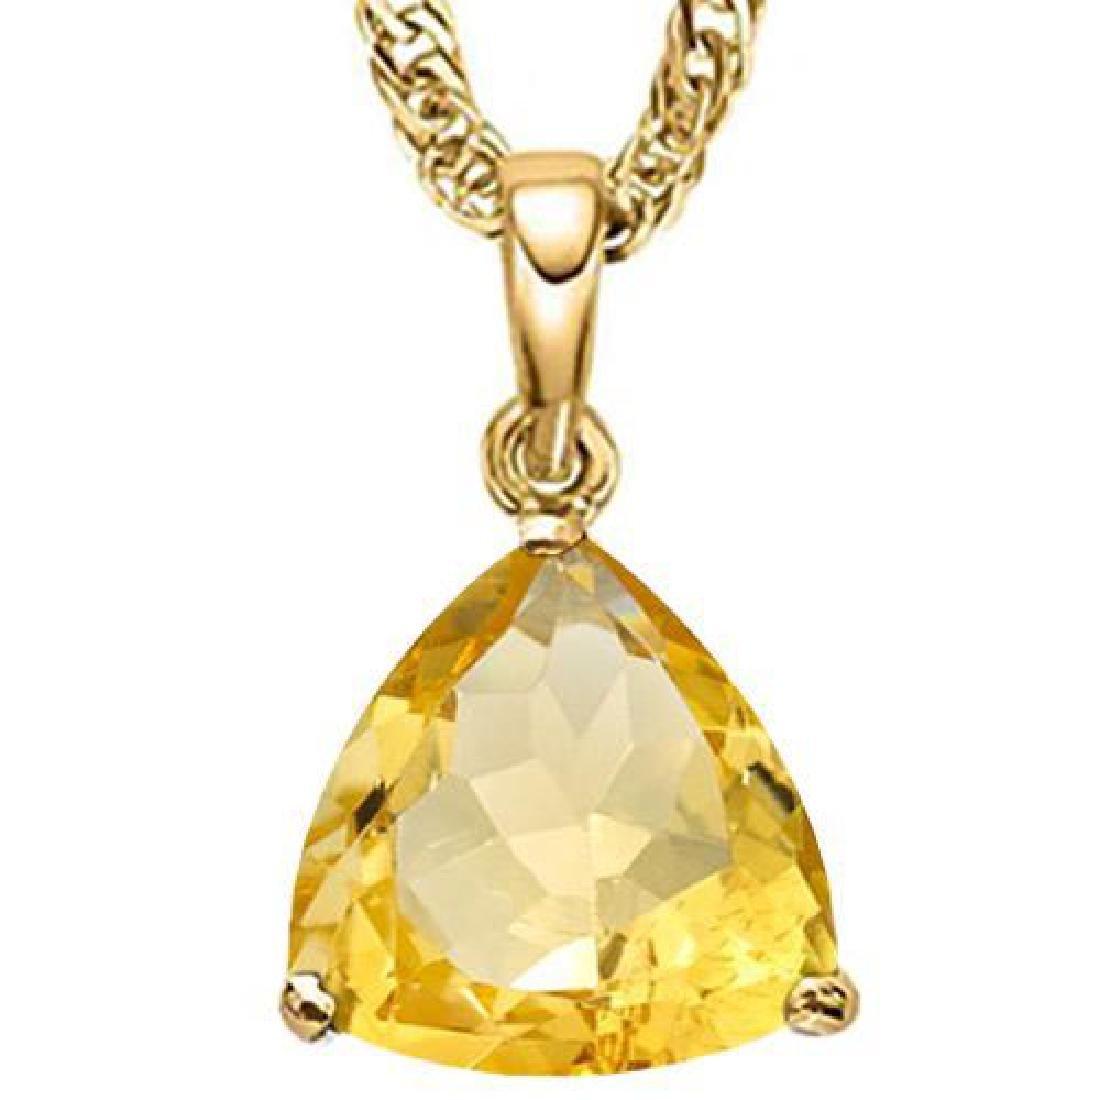 0.7 CTW CITRINE 10K SOLID YELLOW GOLD TRILLION SHAPE PE